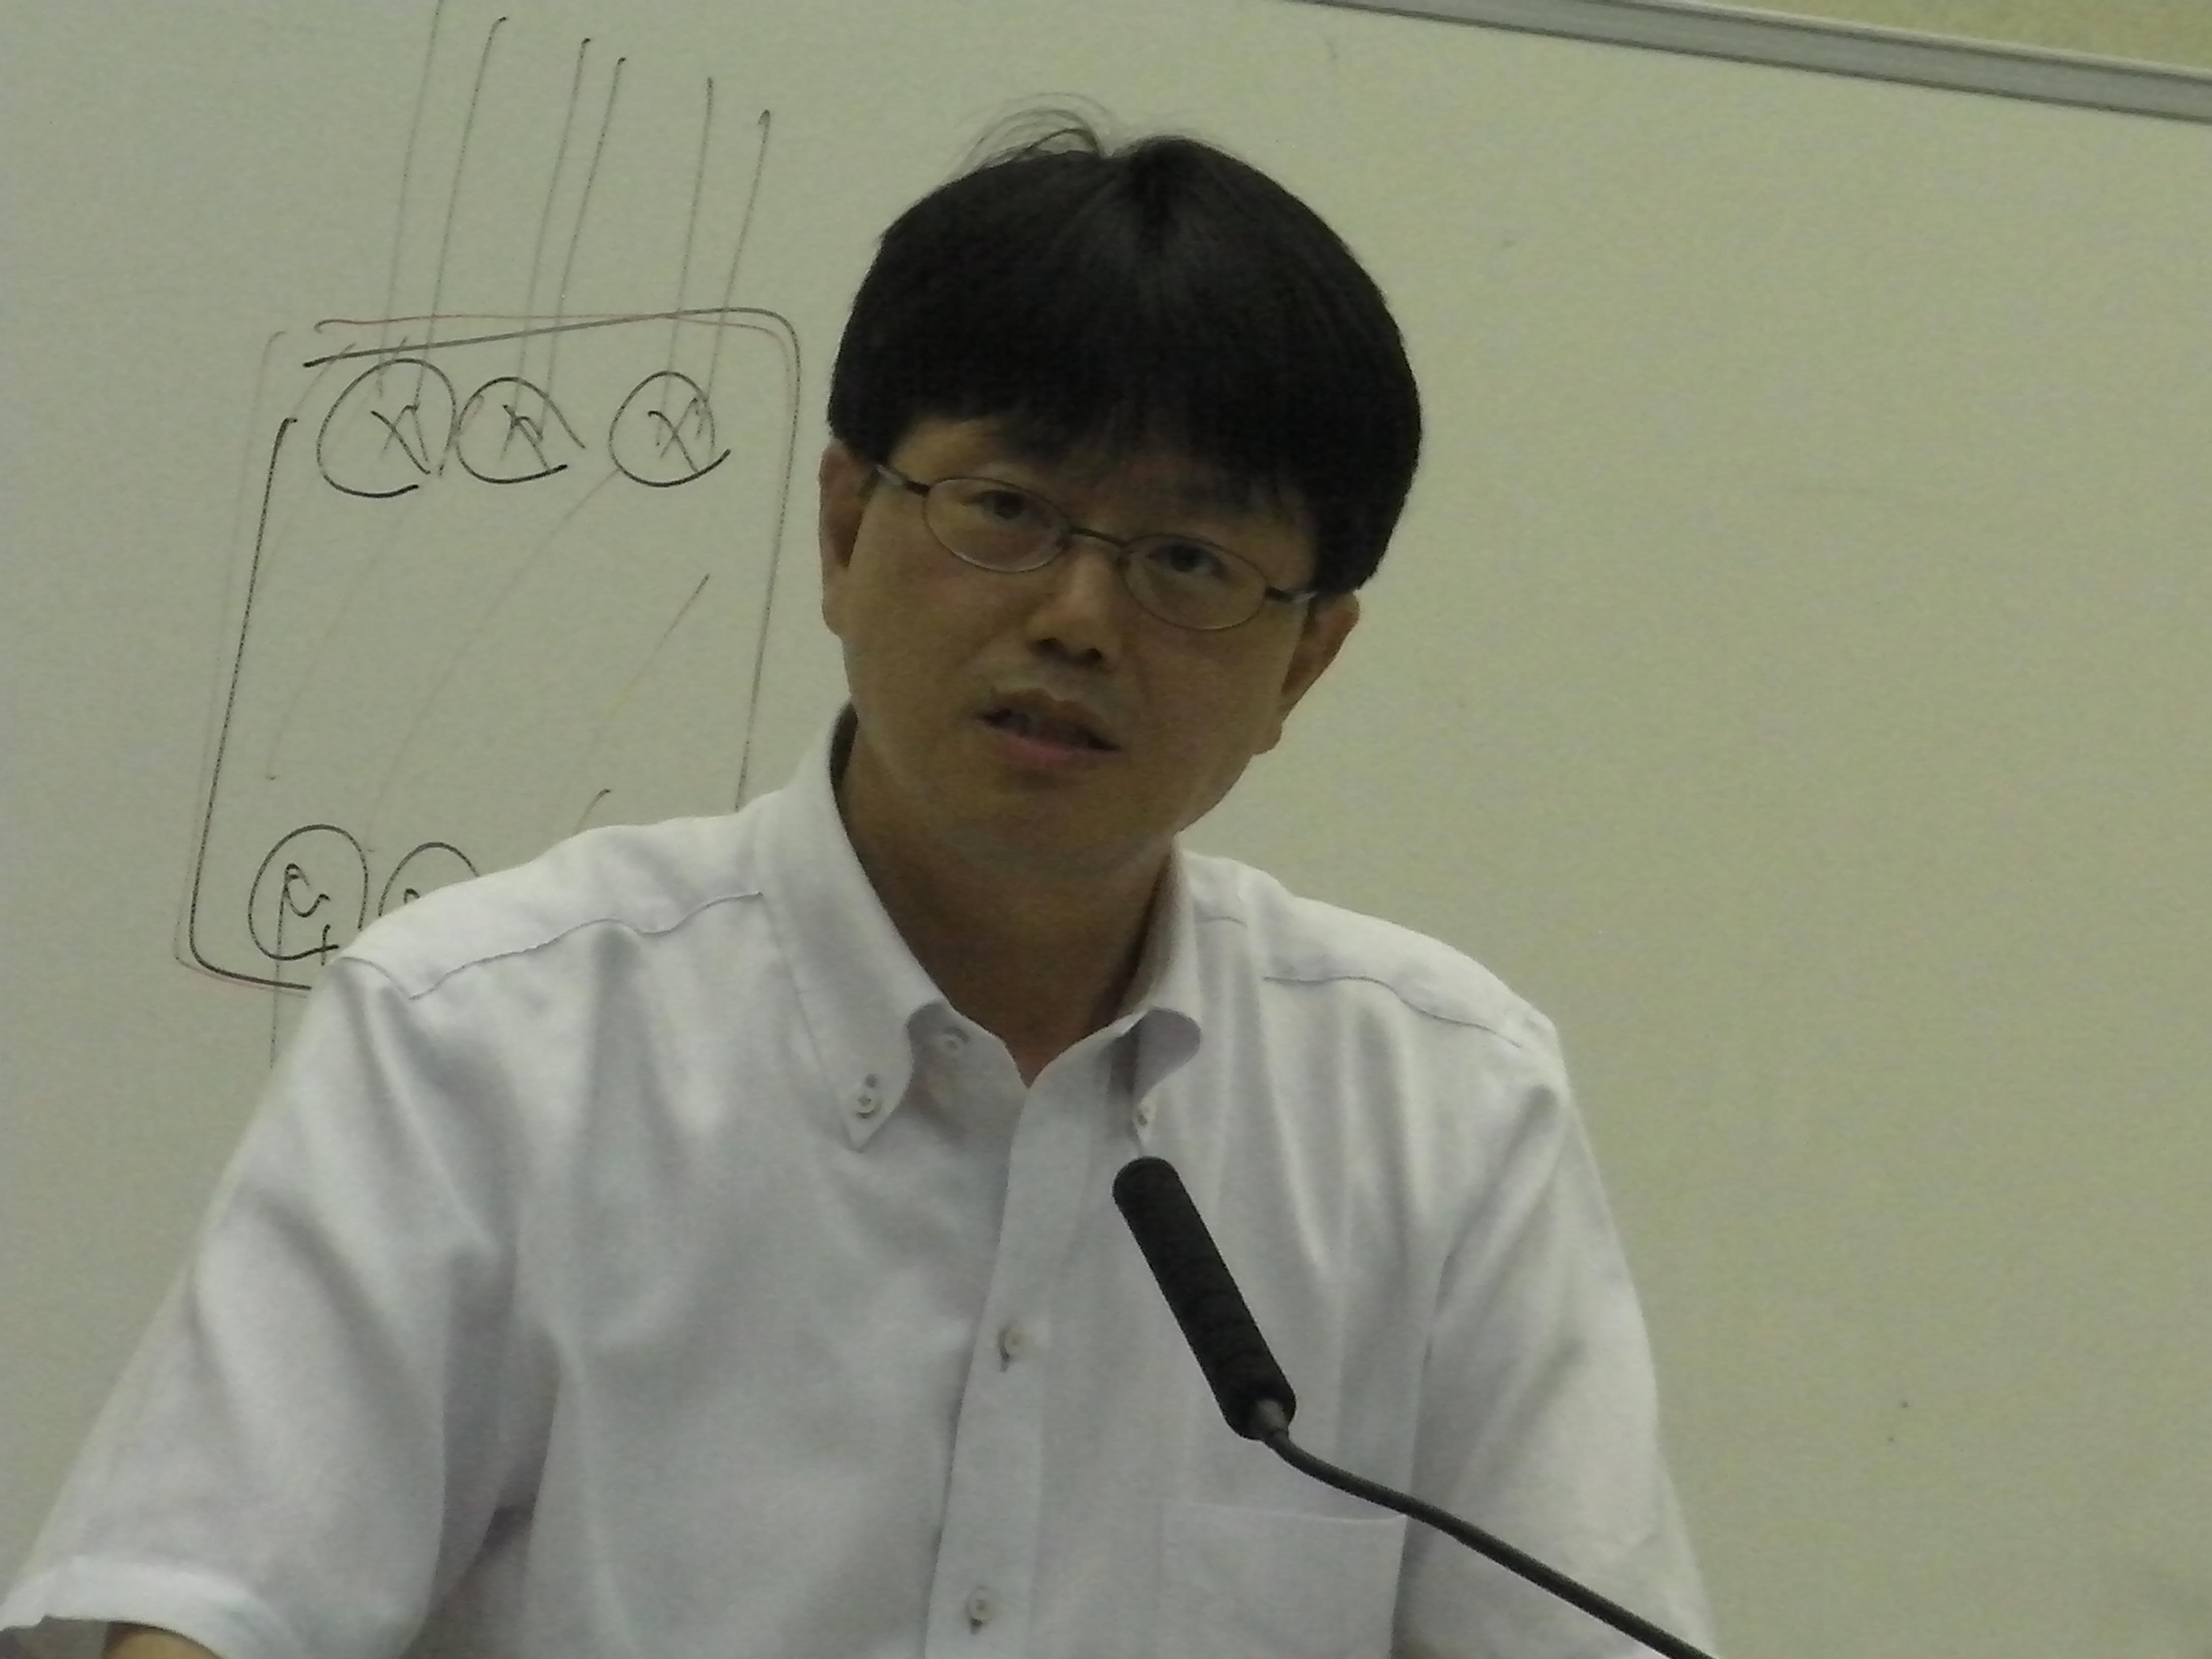 http://daily.magazine9.jp/m9/oshidori/SANY0893.JPG